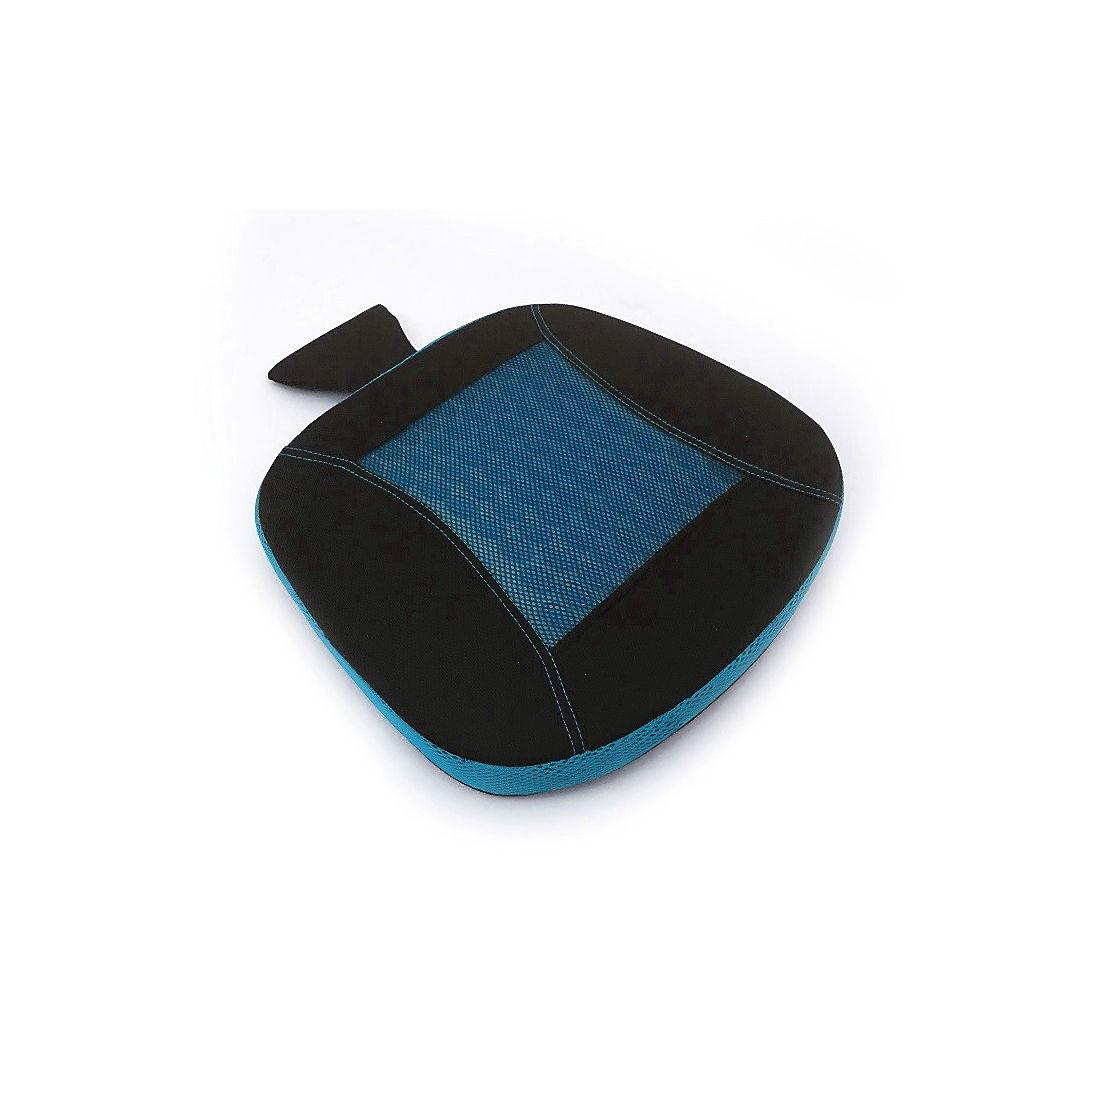 MyRide 2-in-1 Memory Foam Gel Seat Cushion